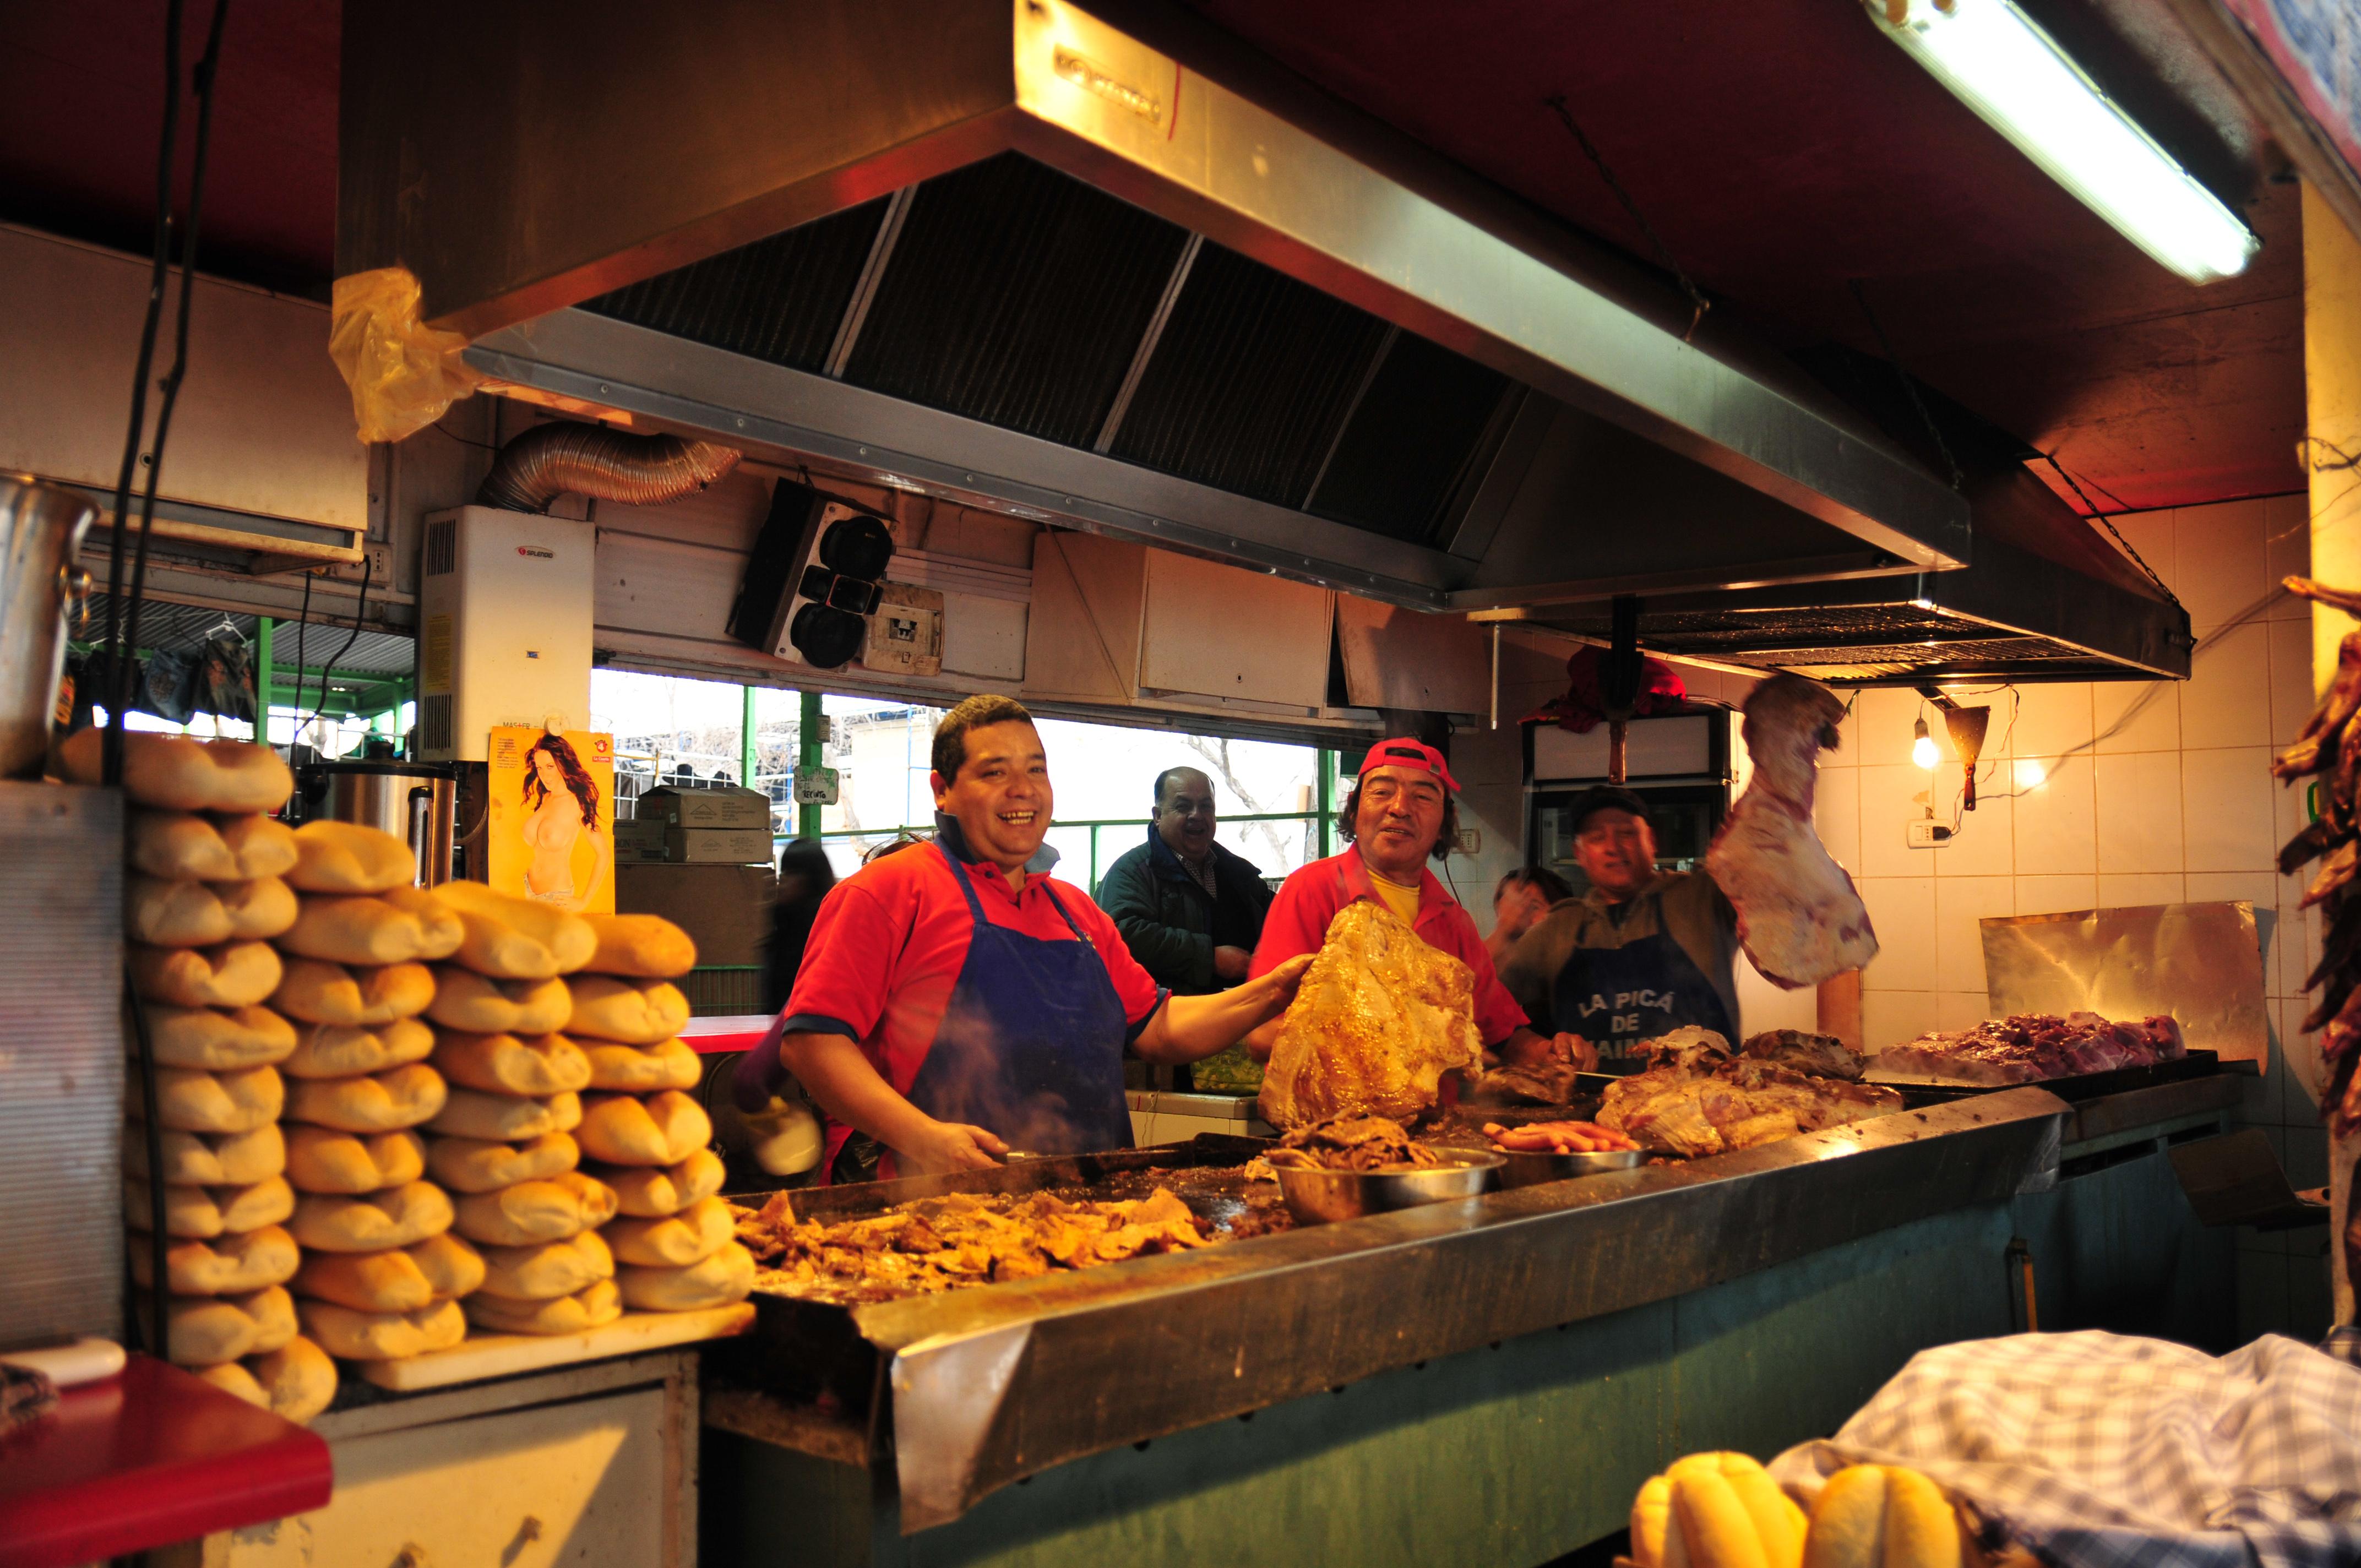 Guía Urbana de Santiago: Barrio Franklin, Plataforma Urbana